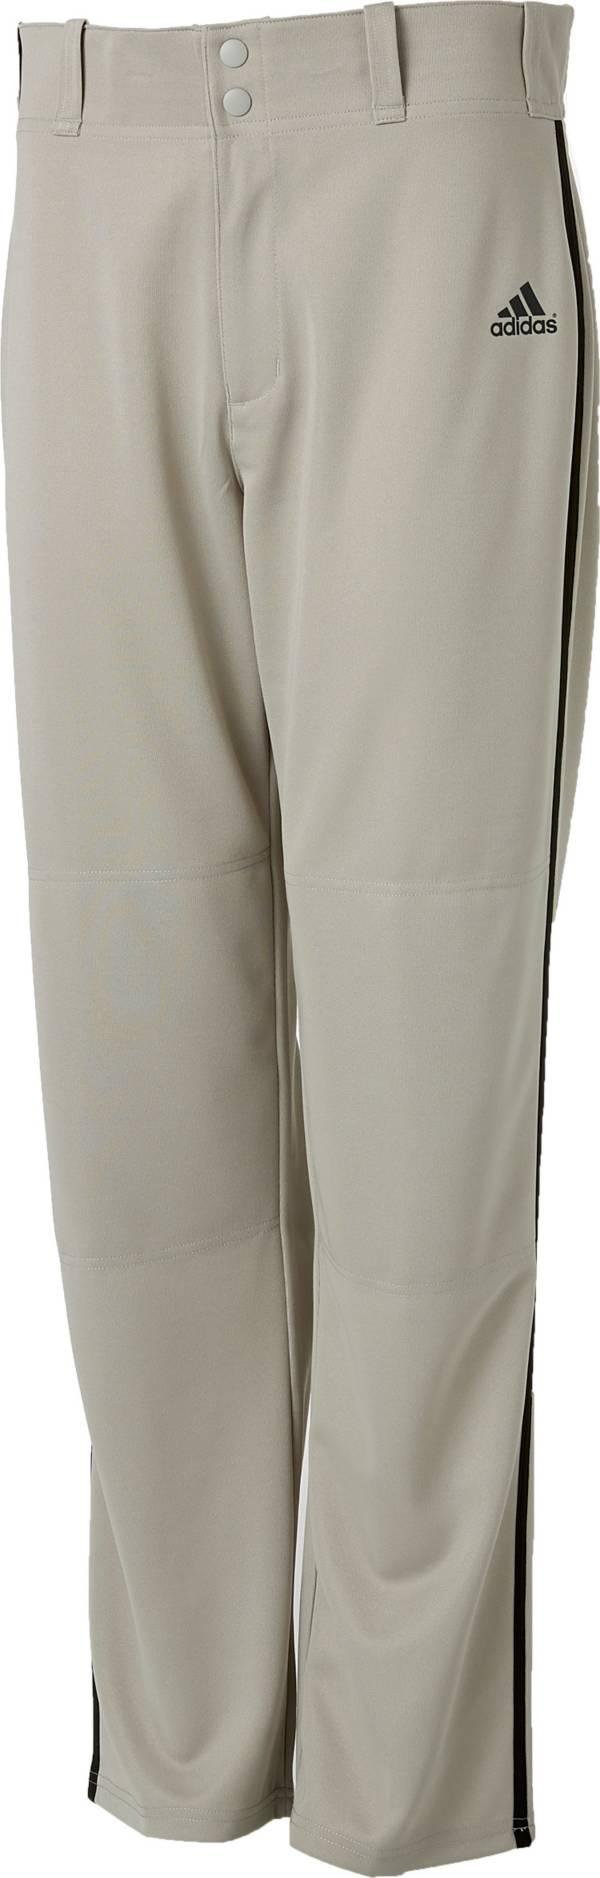 adidas Men's Triple Stripe Open Bottom Piped Baseball Pants product image